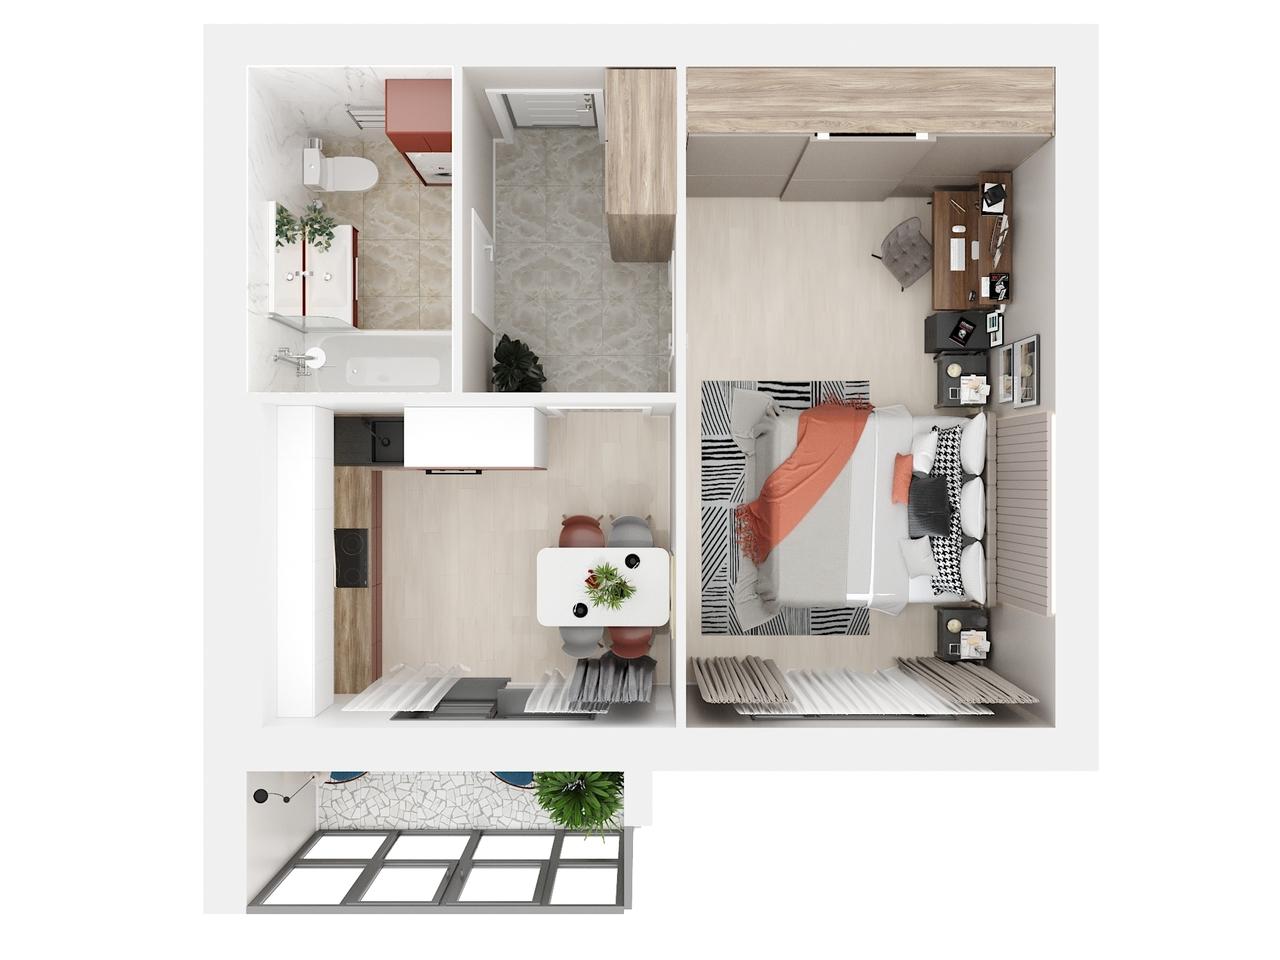 Дом 1 - 1-комнатная №59